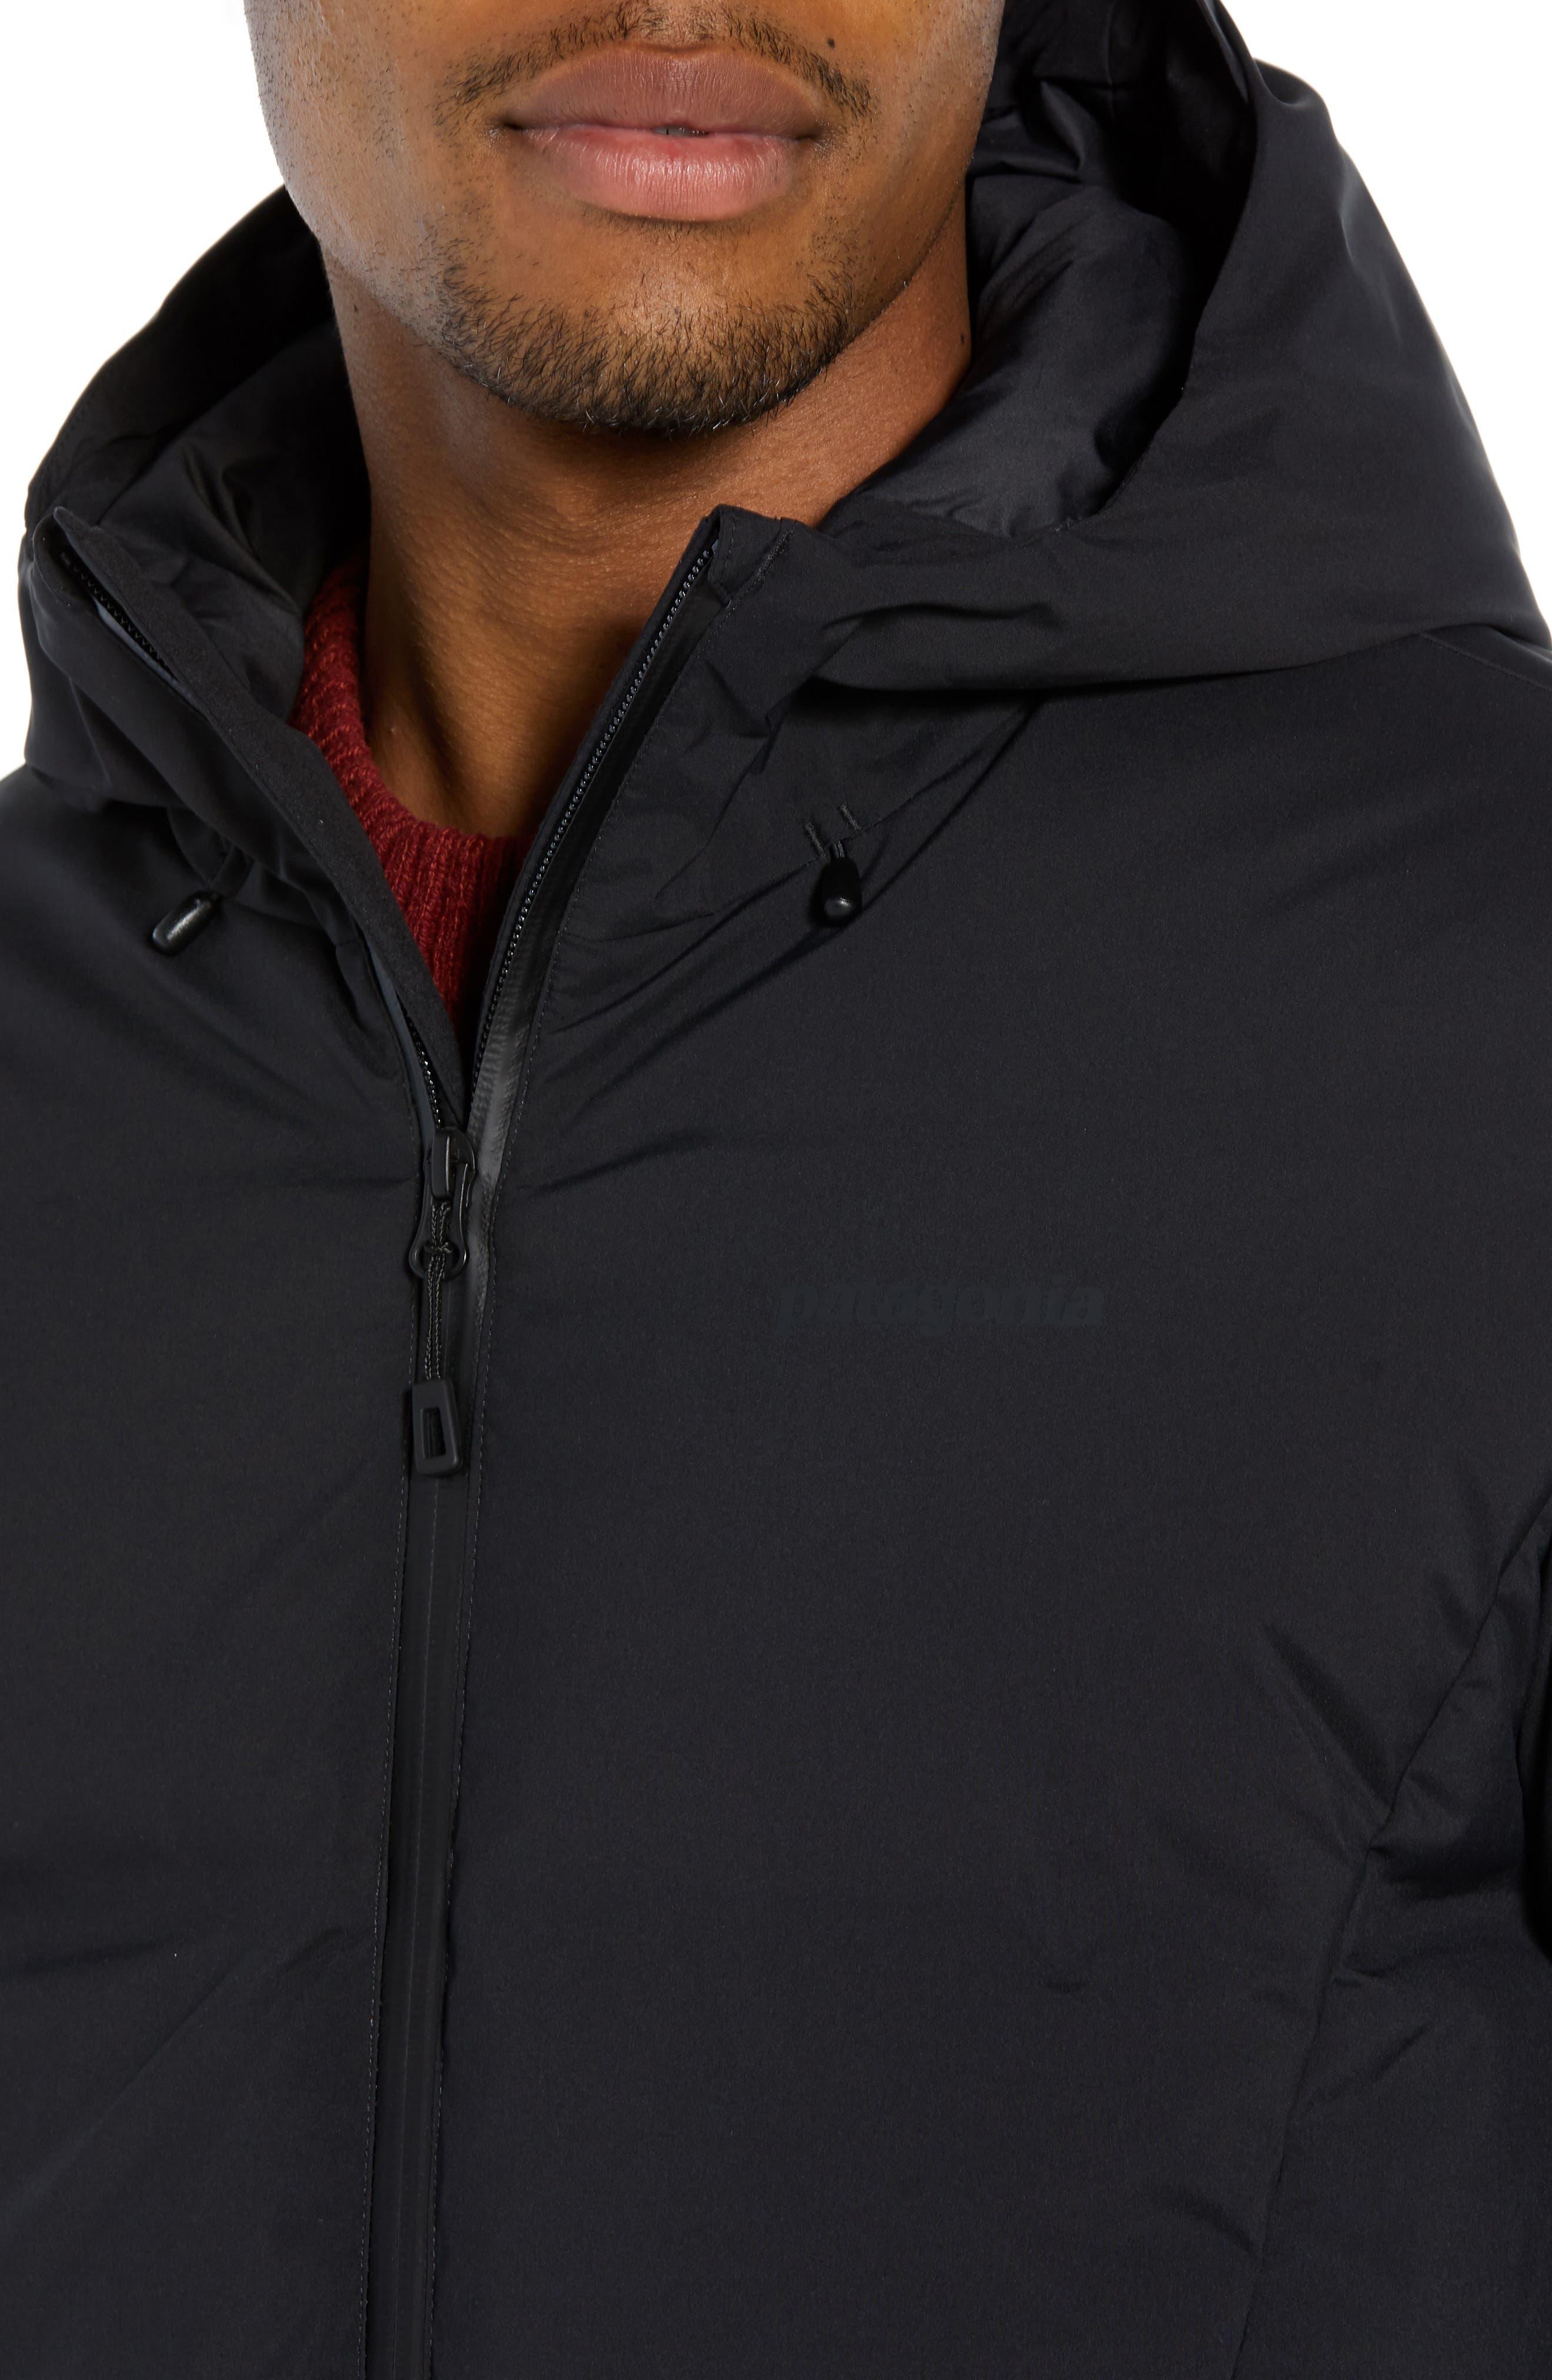 Jackson Glacier Jacket,                             Alternate thumbnail 4, color,                             001